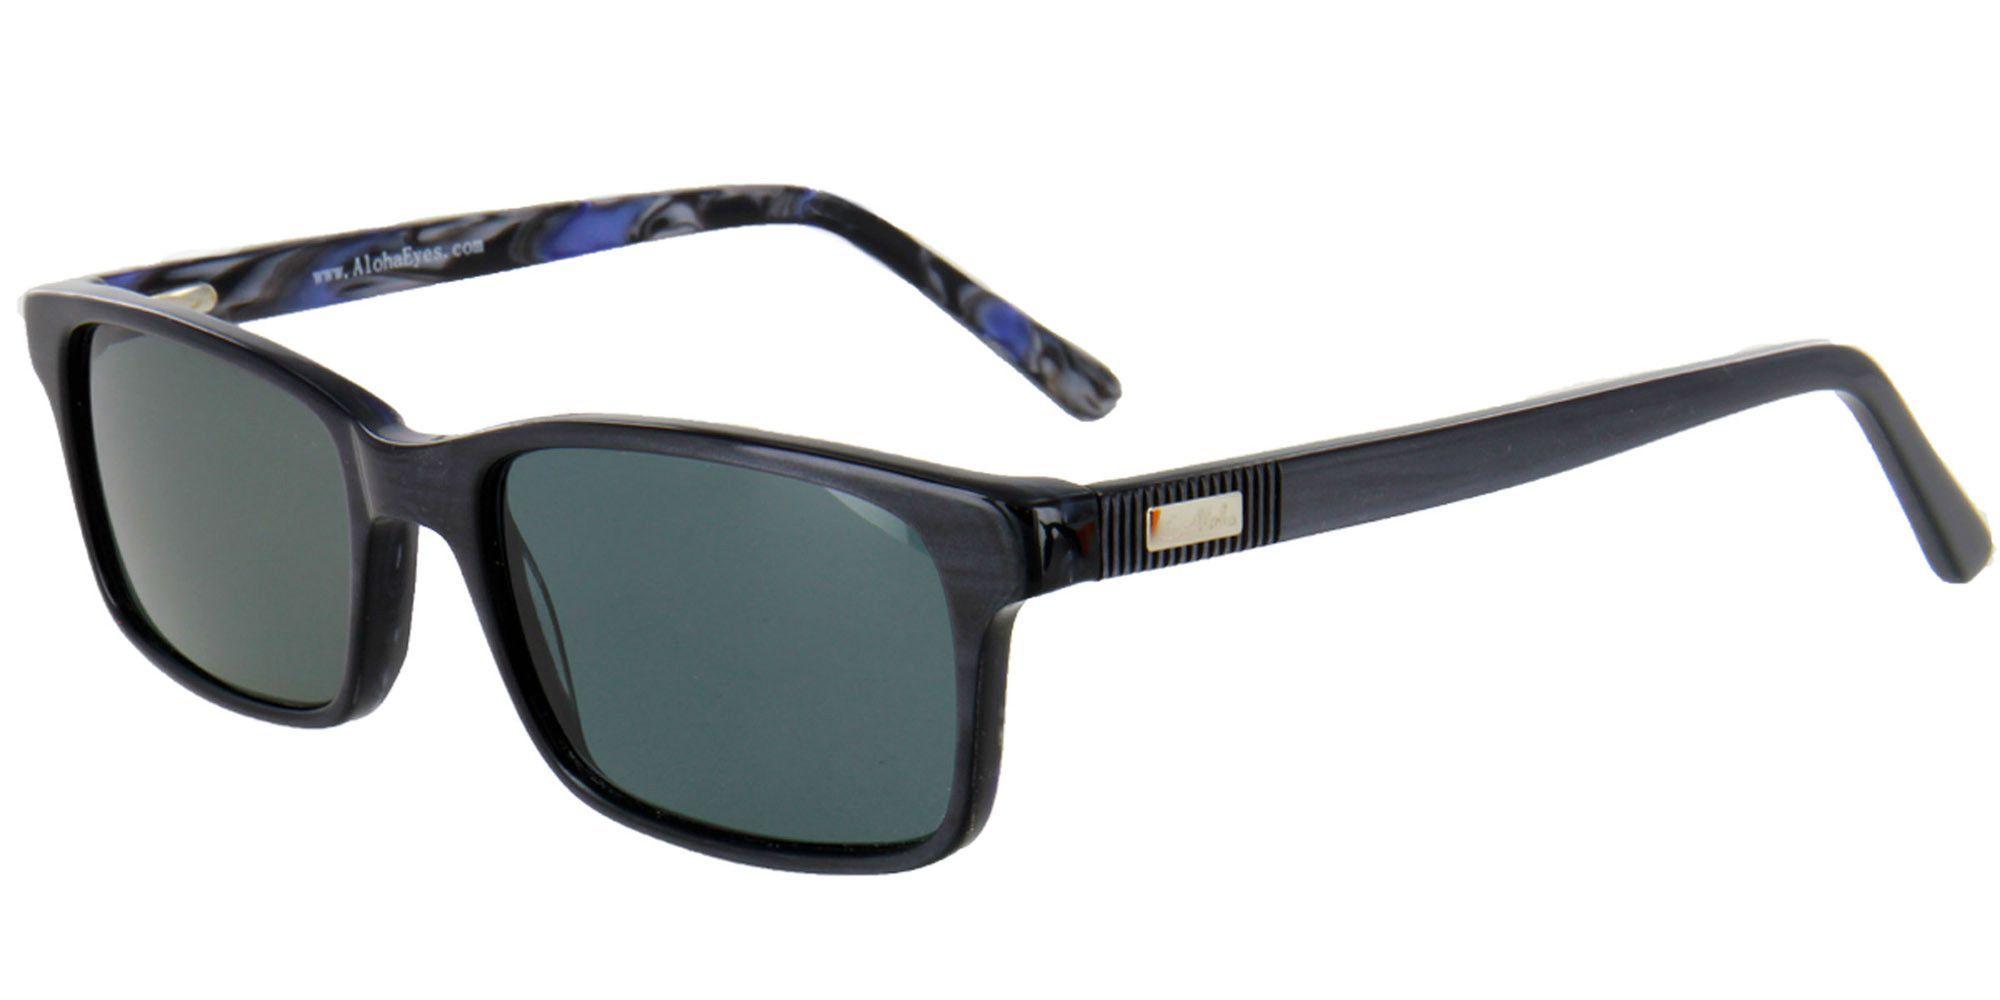 Aloha eyewear tek spex 1006 digital progressive bifocal